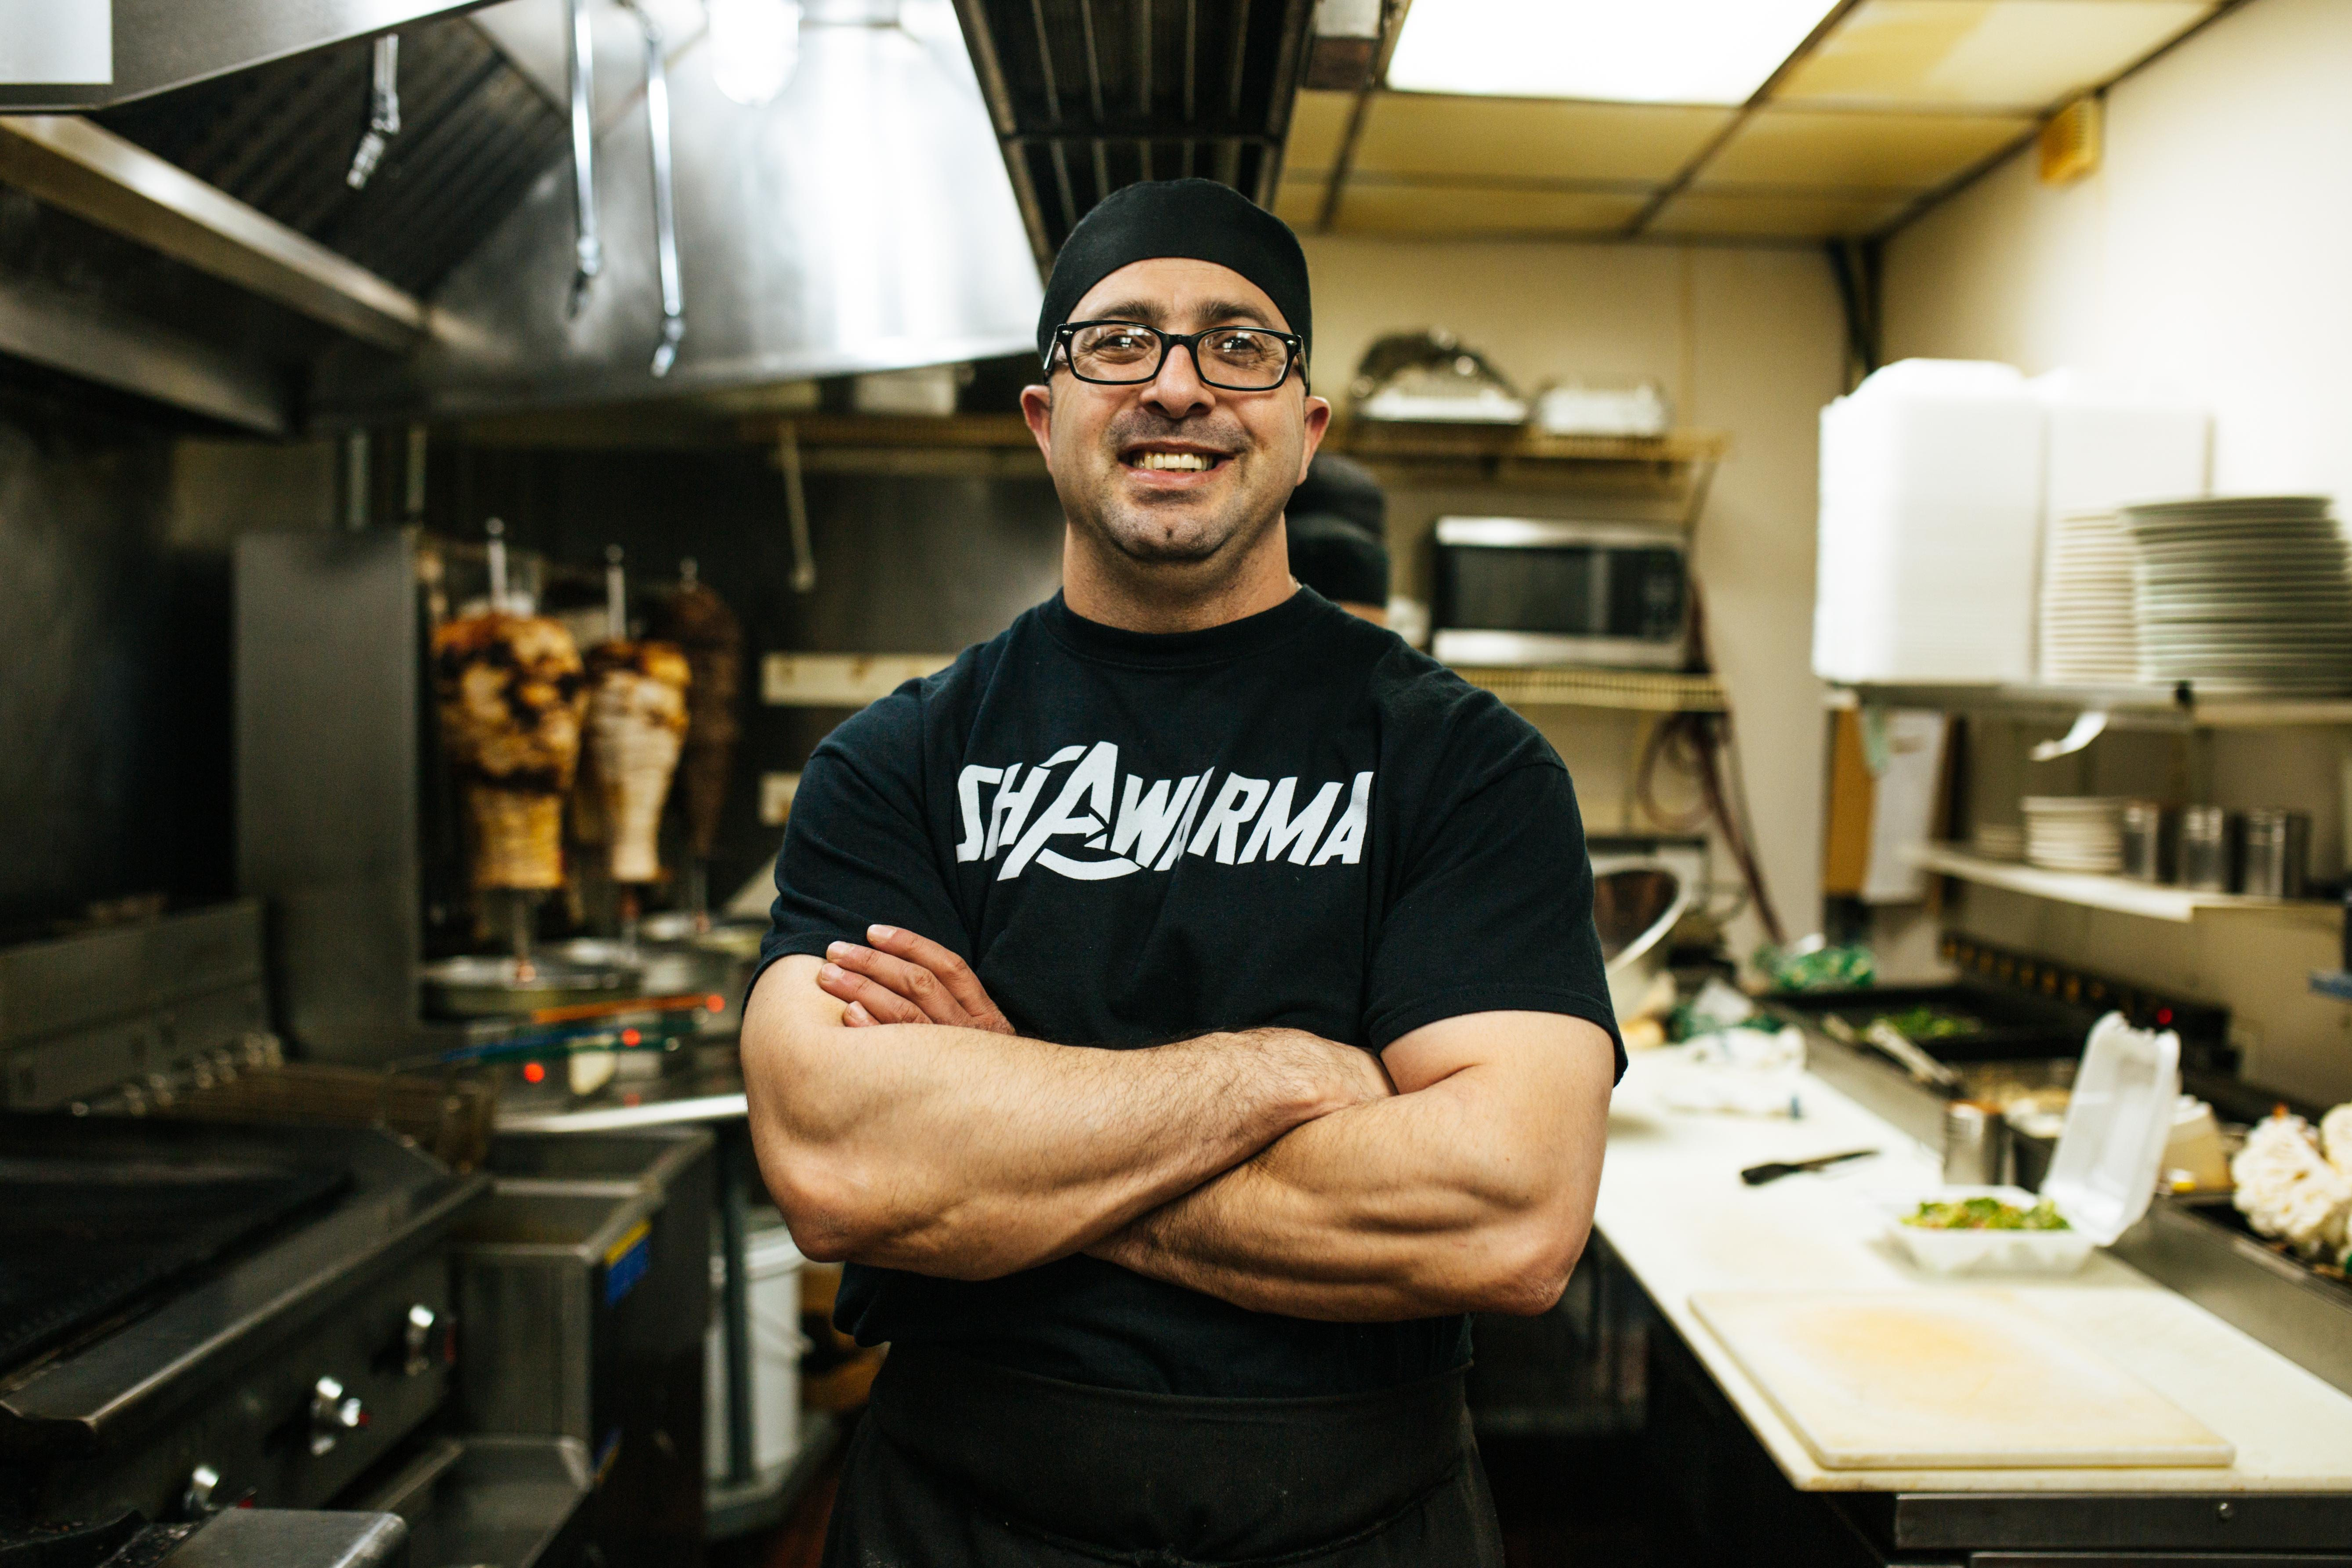 ShawarmaKing-1-31.jpg